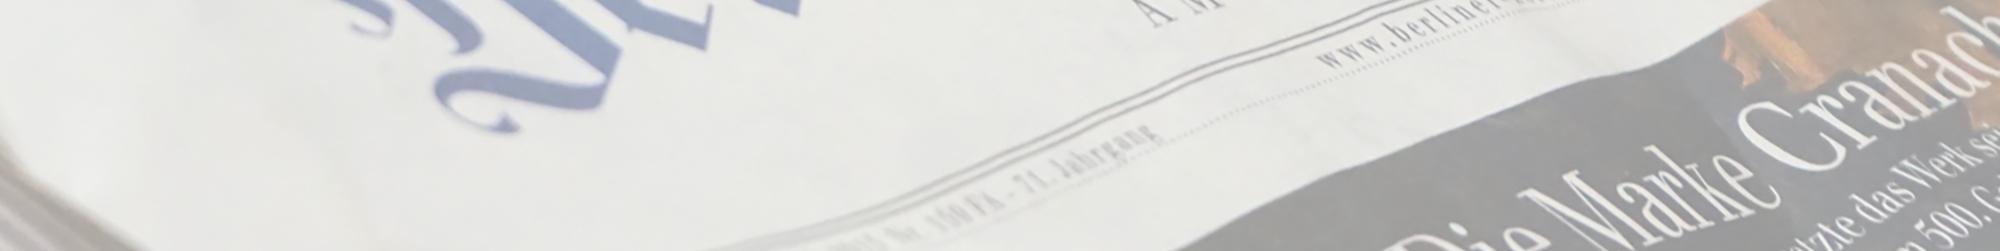 Presse_Lumar-Unternehmerbeteiligung_Mittelstandsexperte-KMU-experte-Presse_pexels-photo_-1500x251